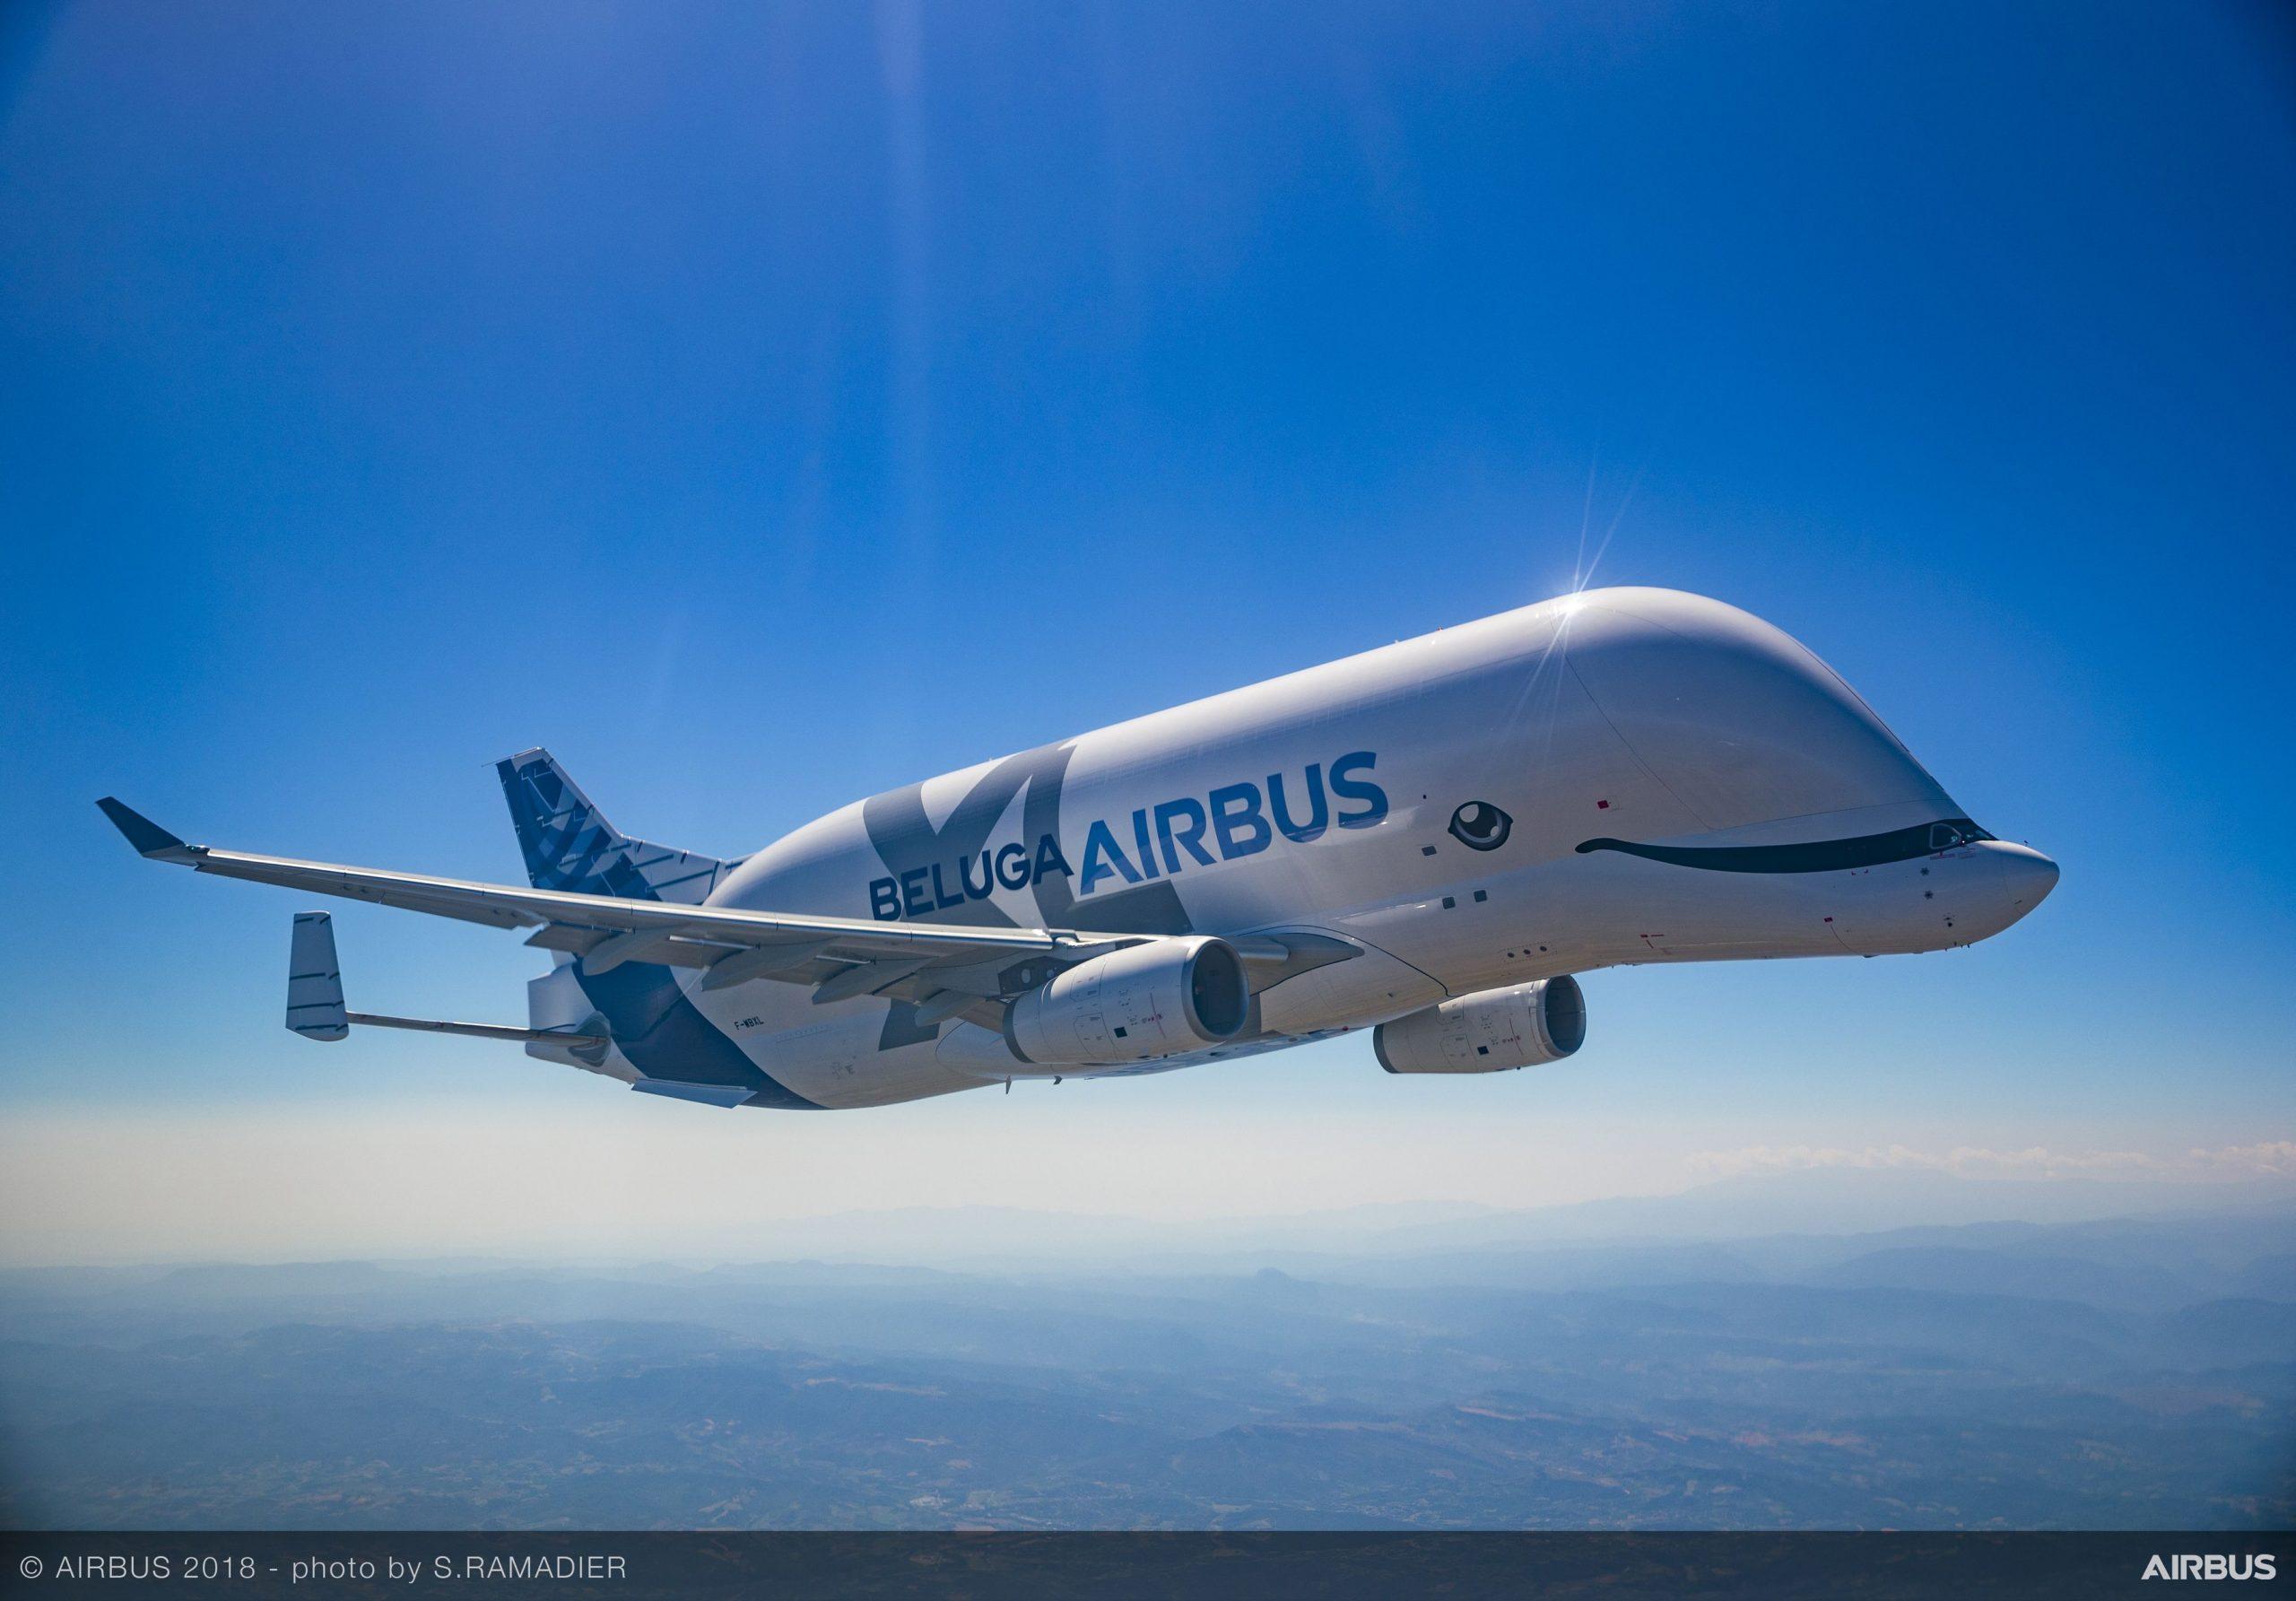 Airbus' nye transportfly, BelugaXL, blev sat i drift den 9. januar. Foto: Airbus